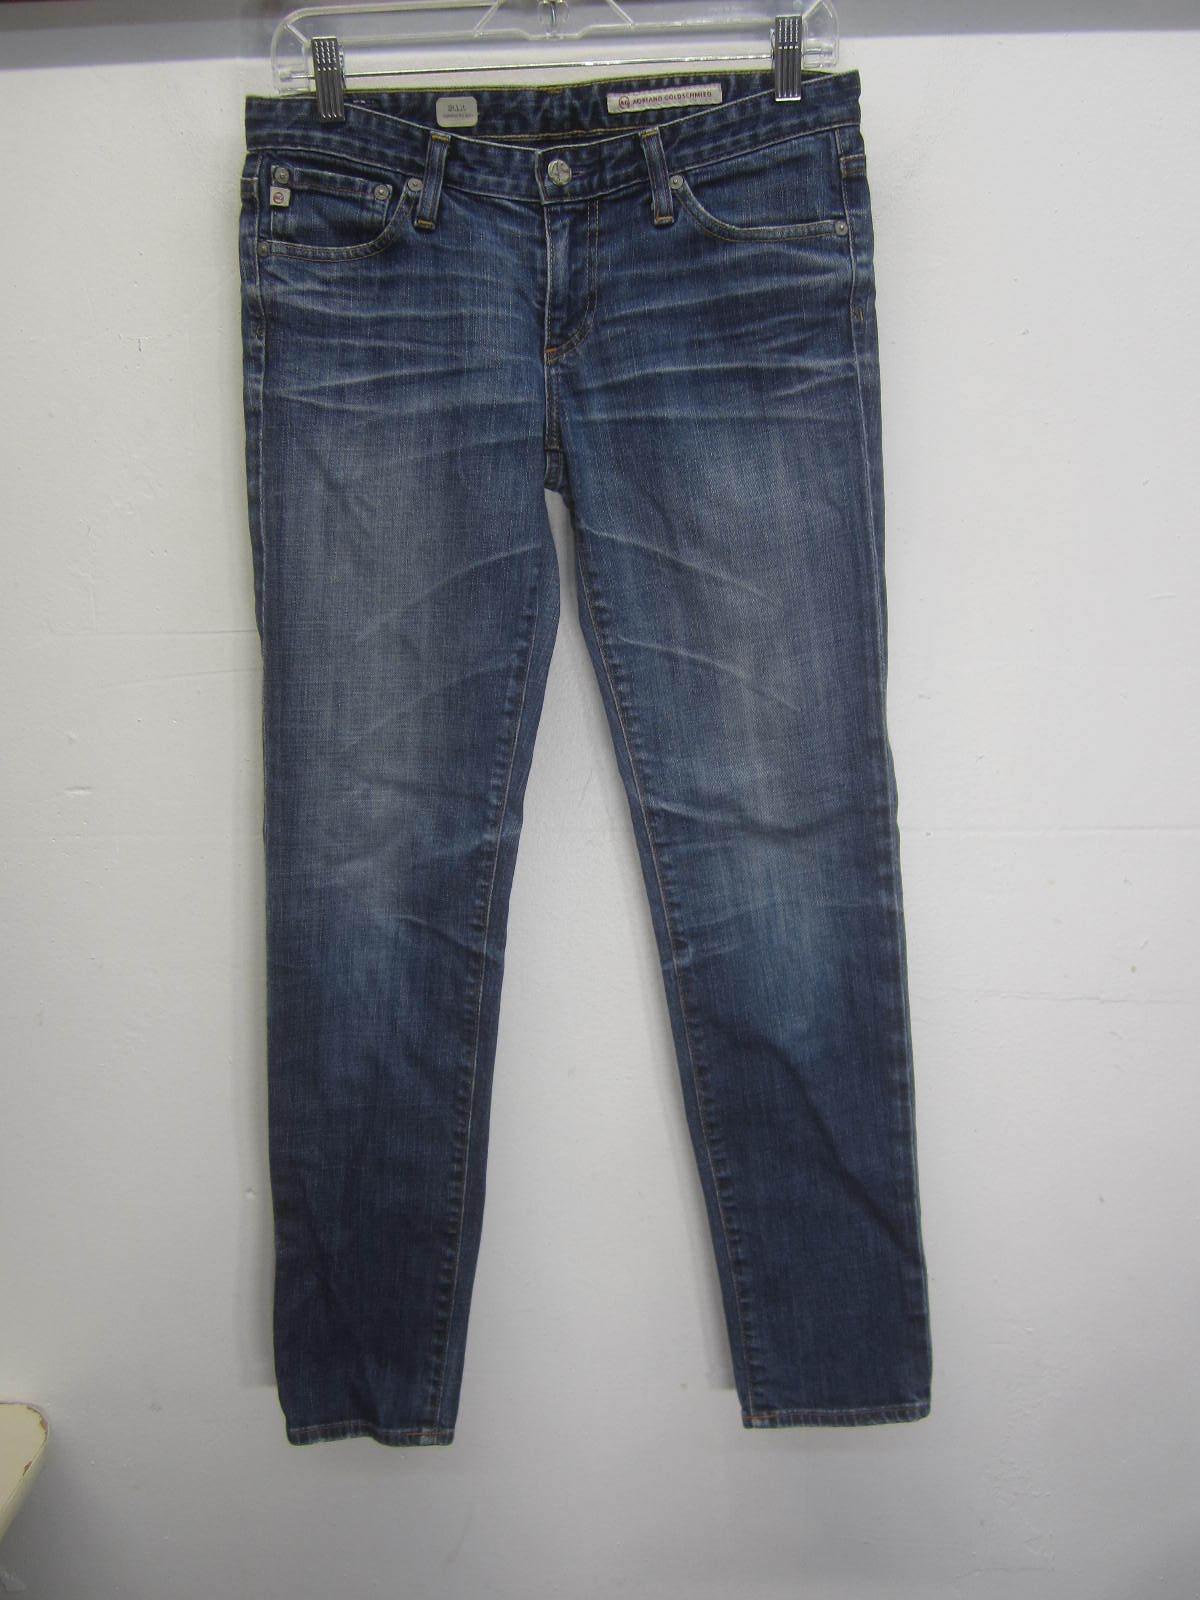 Vtg Adriano goldschmied bluee Jeans Stilt cigarette leg medium wash sz 28R